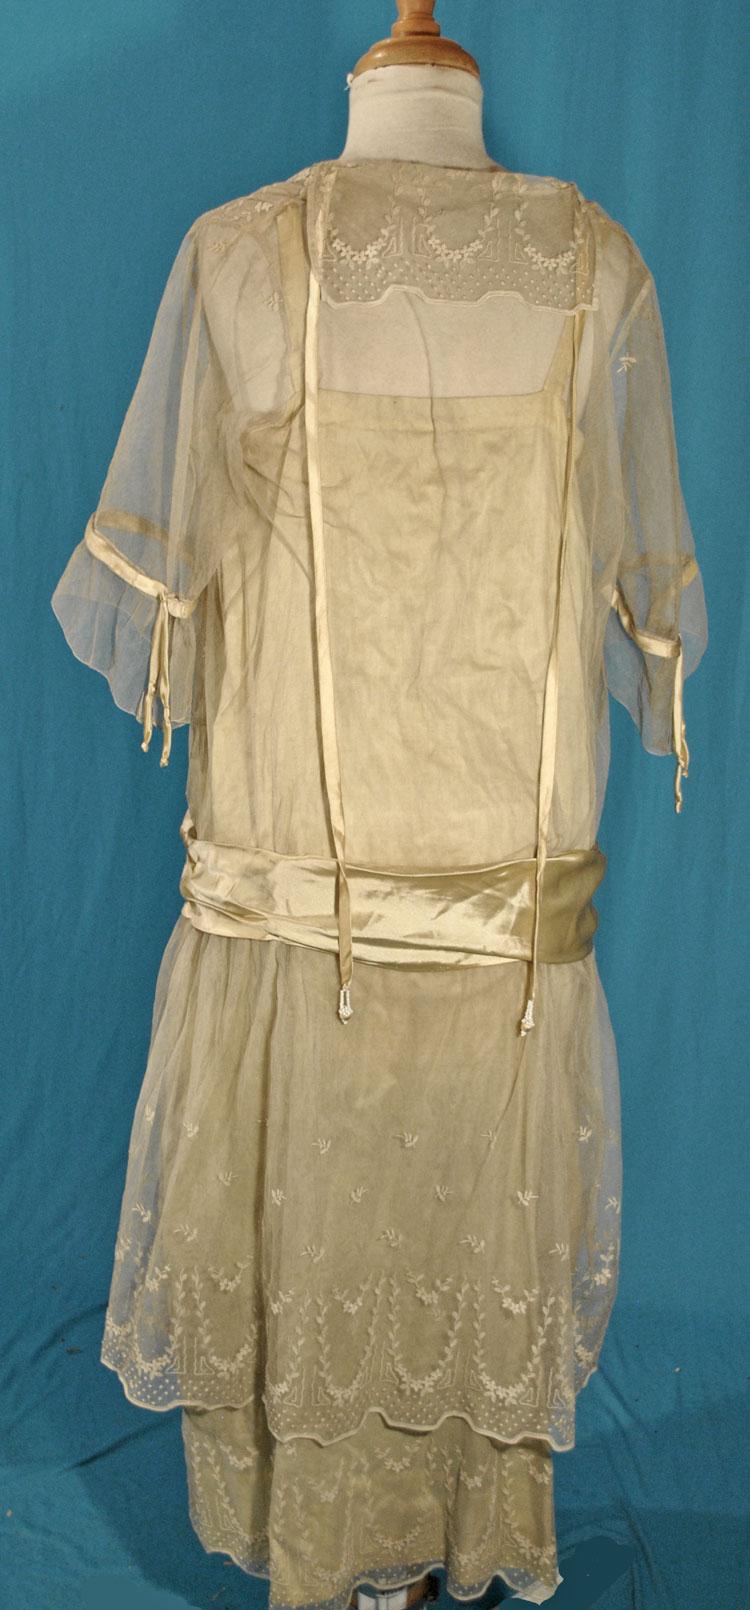 Antique Dress 1925 Fine White Tulle Machine Embroidered